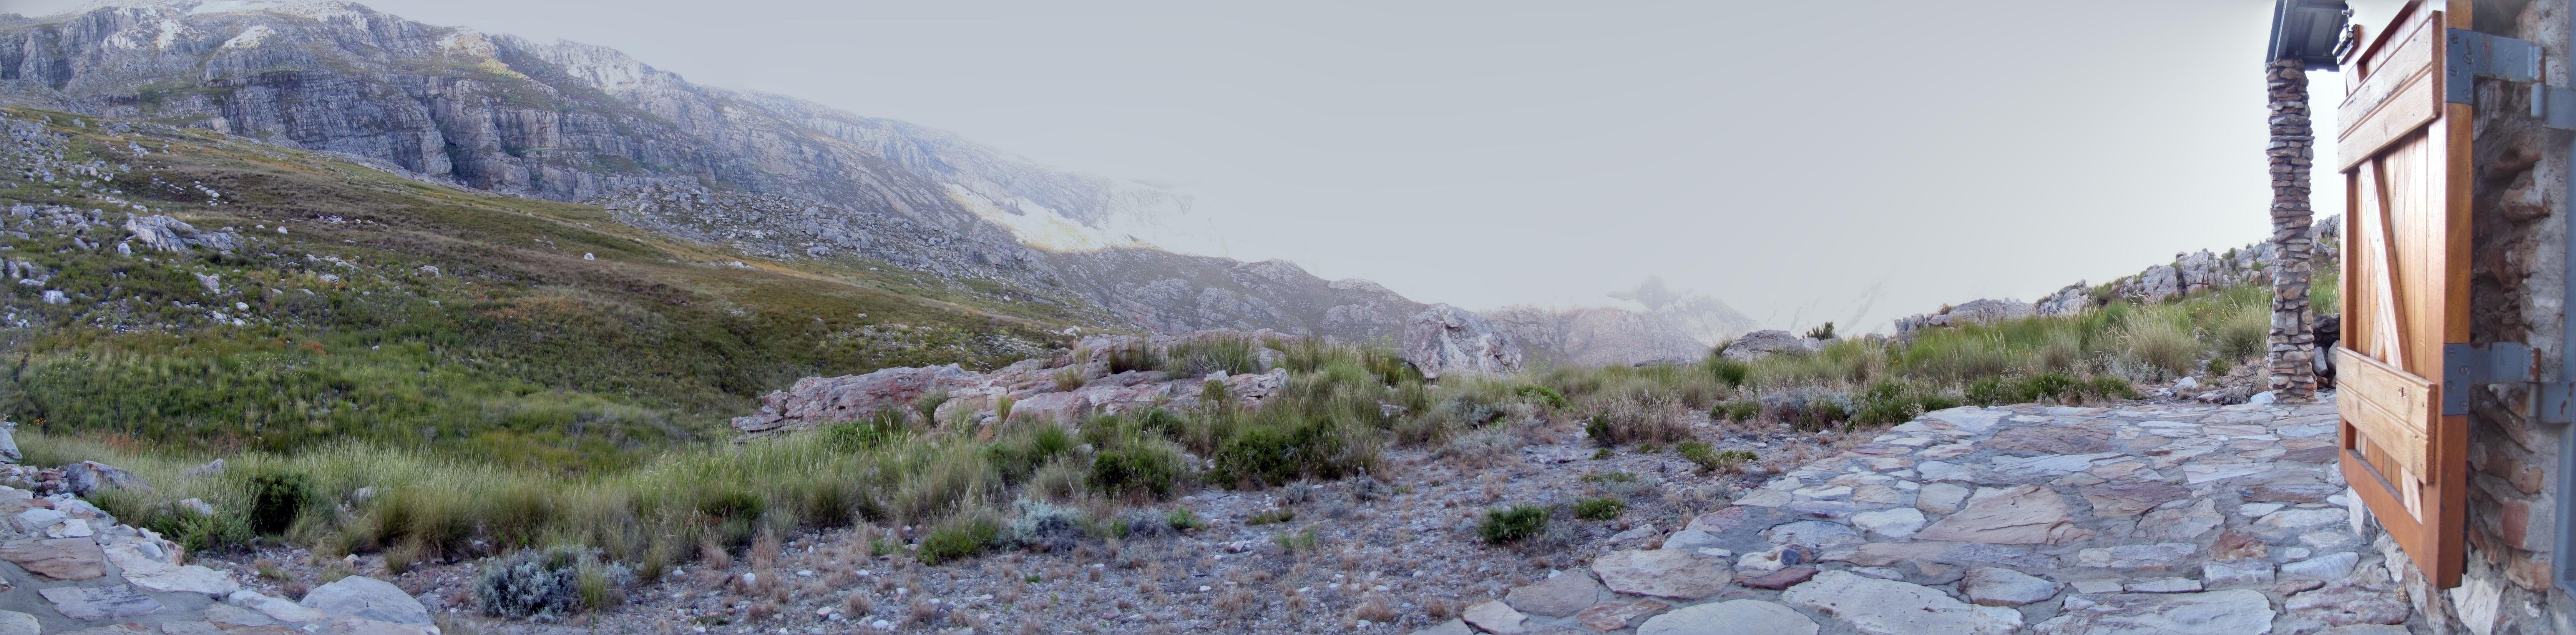 Hiking SA Mountain trails and the world